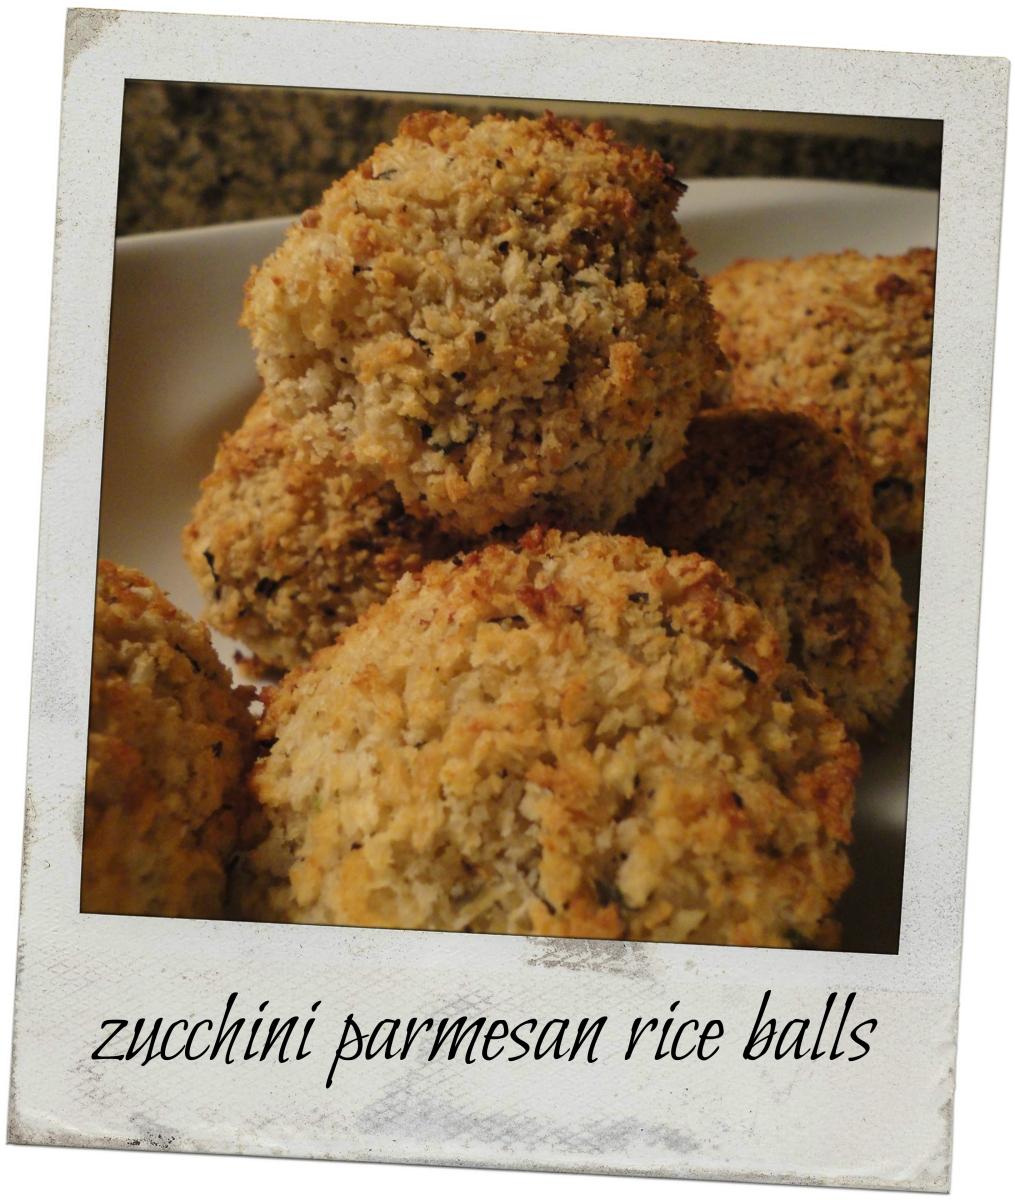 Baked Zucchini Parmesan Rice Balls